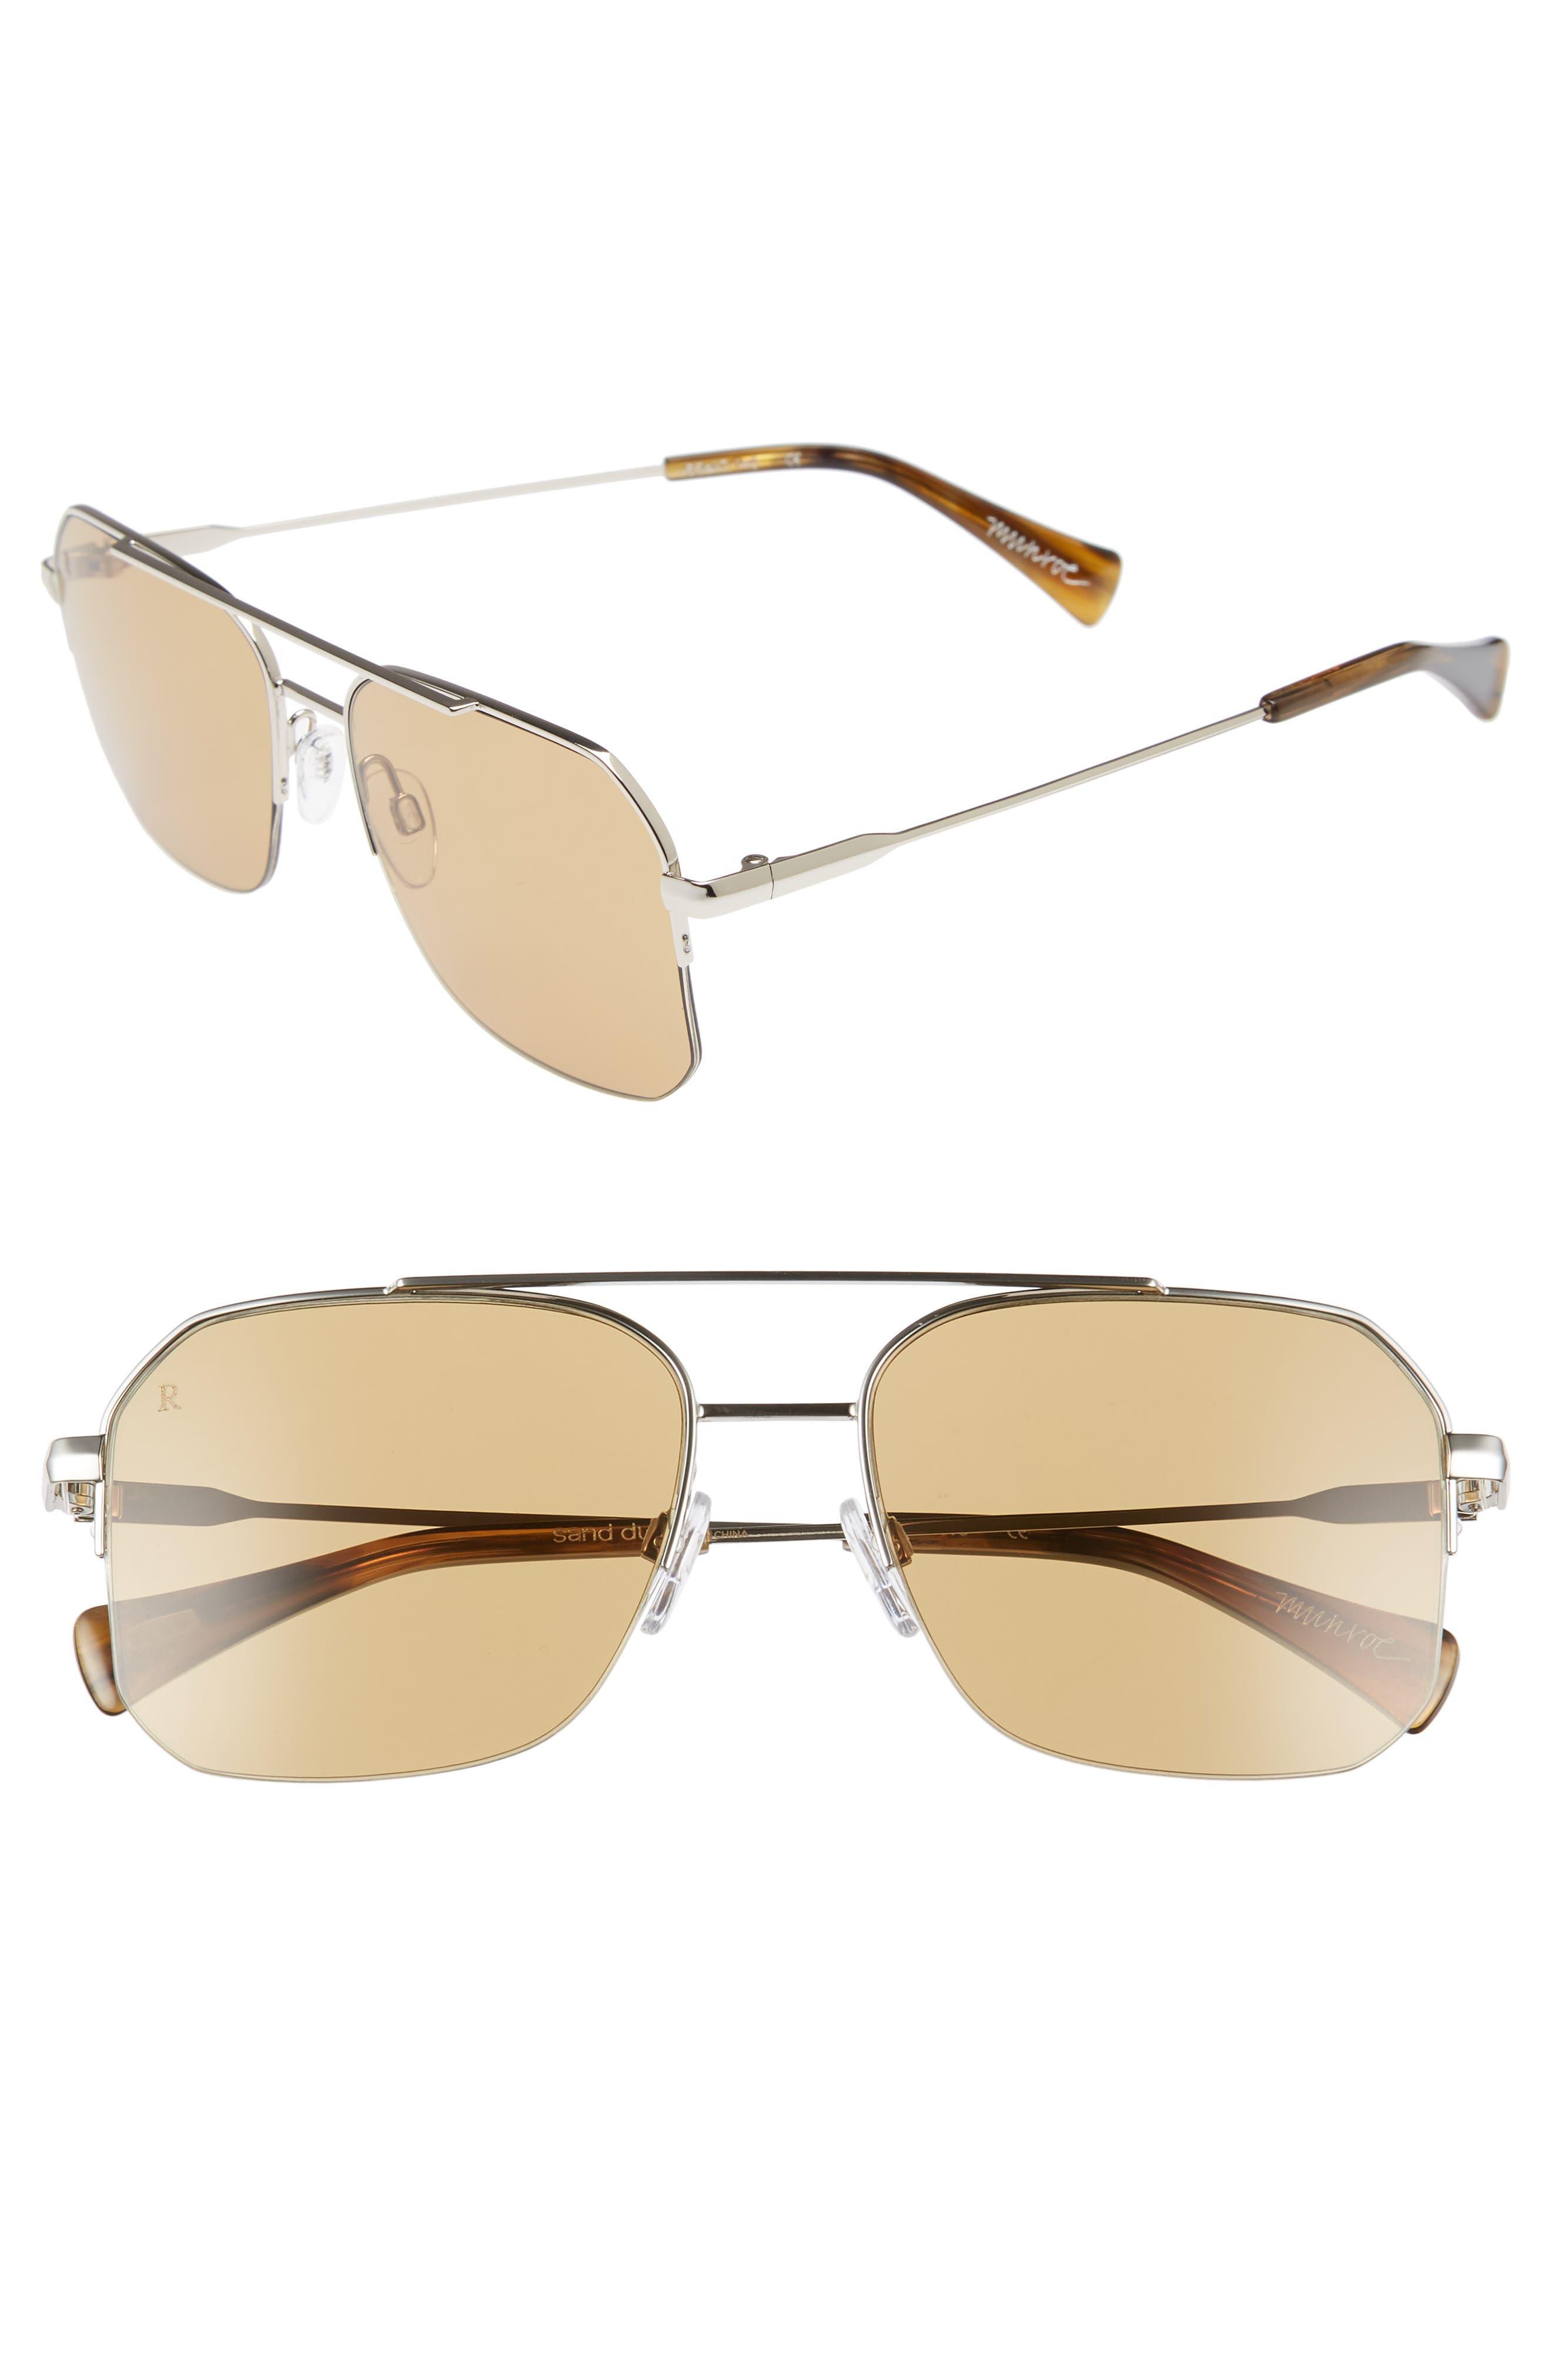 Munroe 55mm Square Aviator Sunglasses,                         Main,                         color, SAND DUNE